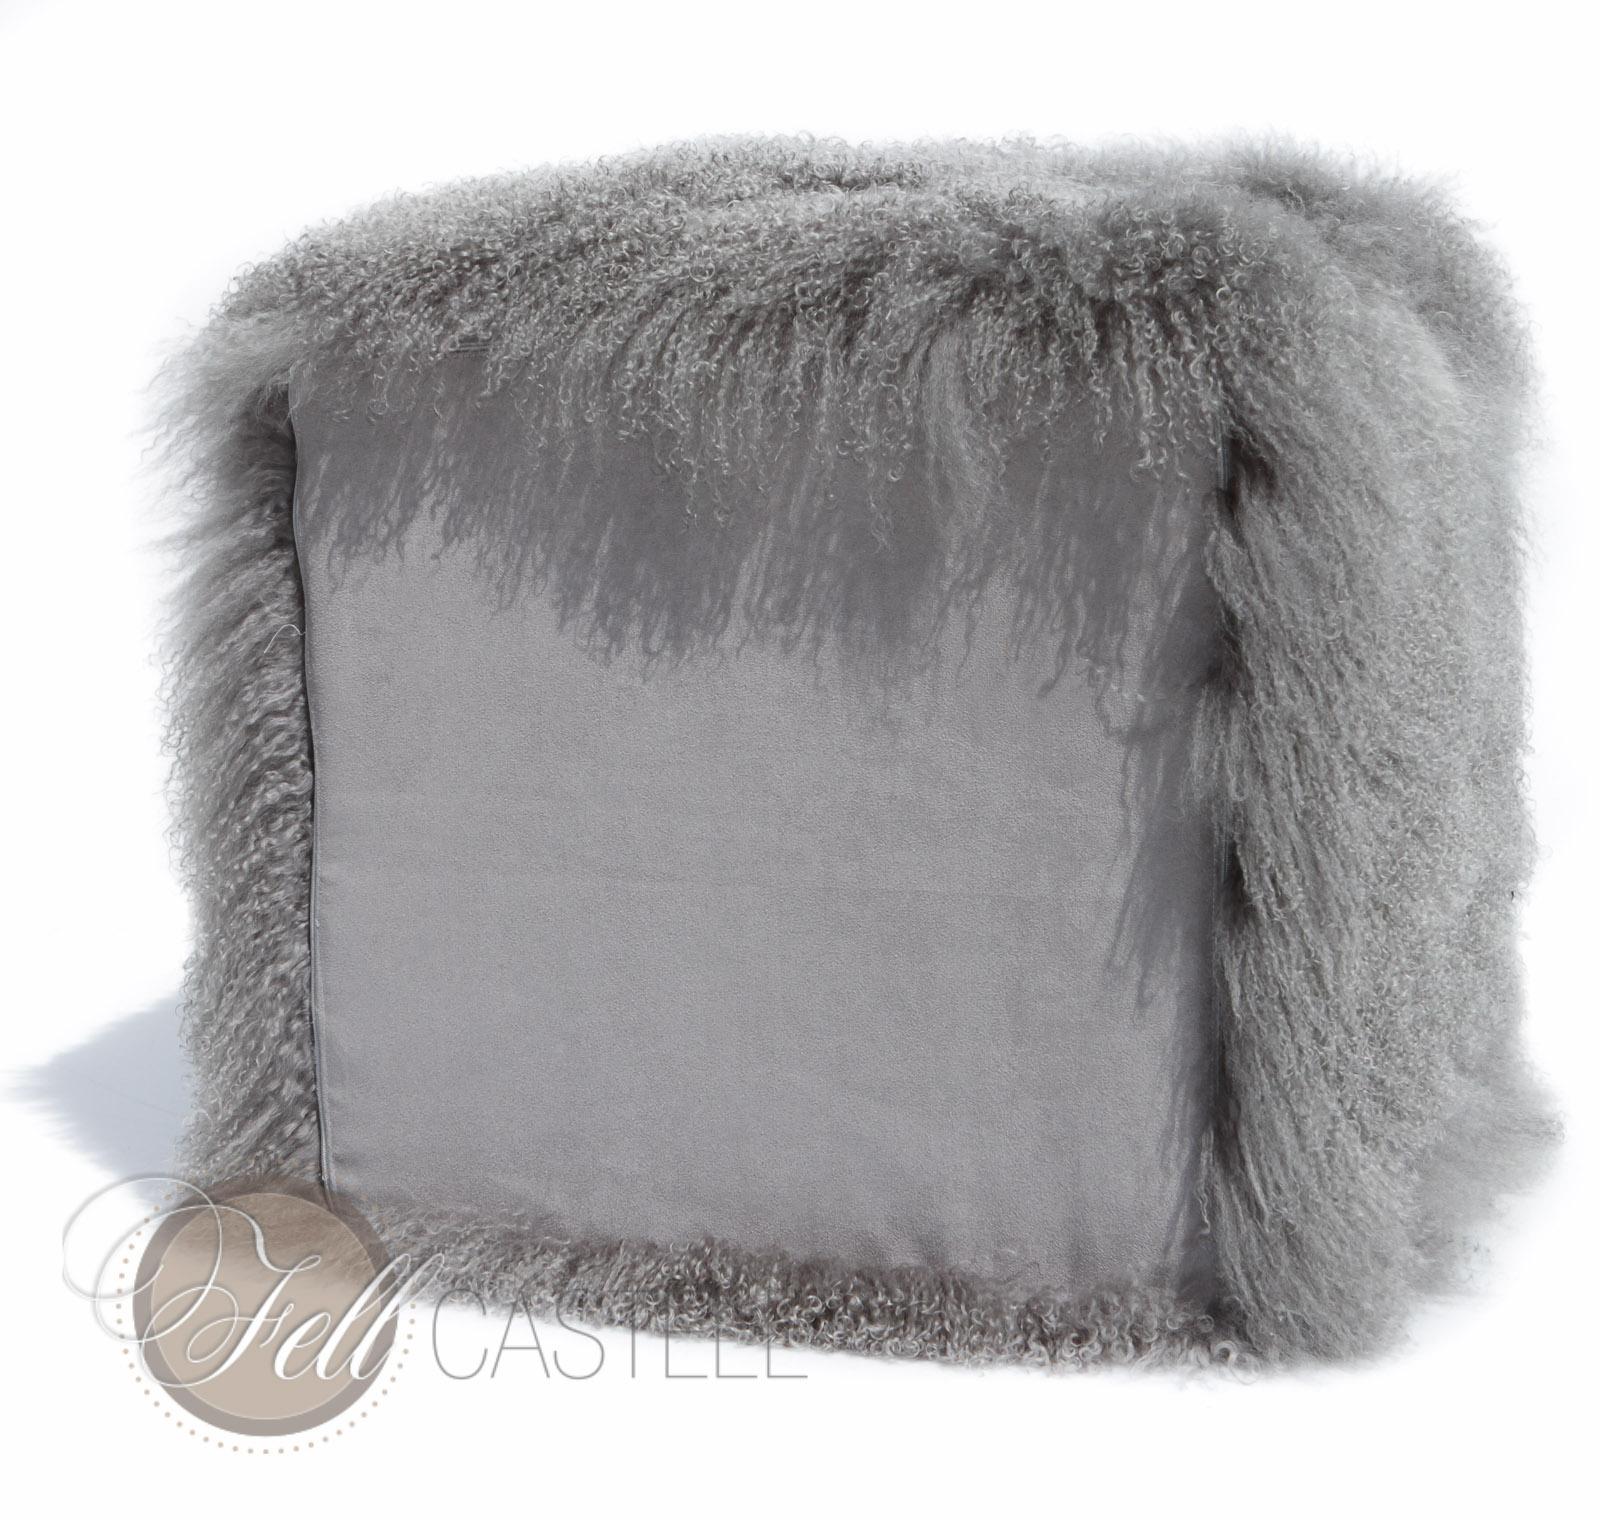 Würfel aus Tibet Lammfell stone grey Tibetlammfell Cube Grau